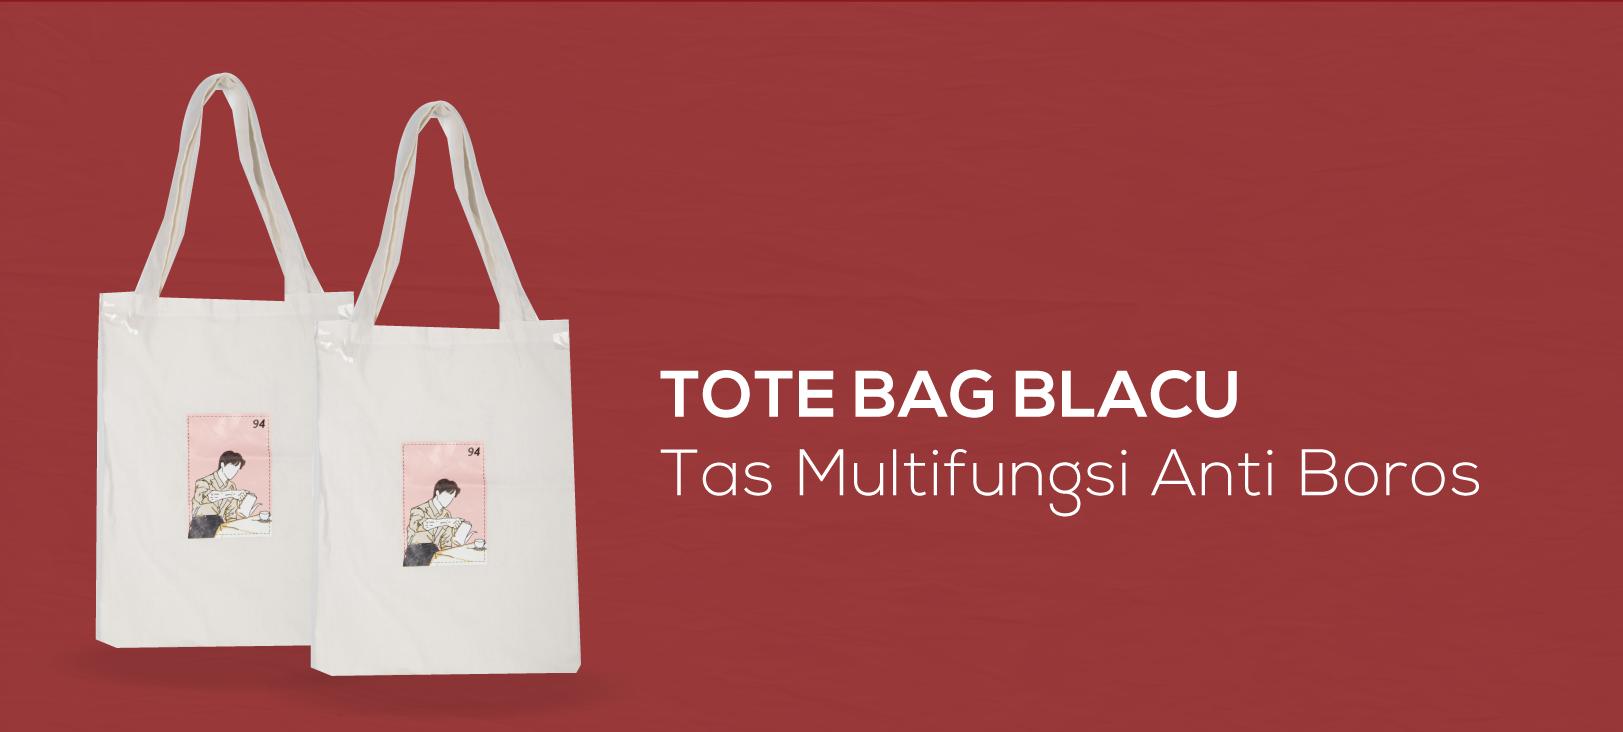 Tote Bag Blacu, Tas Multifungsi Anti Boros